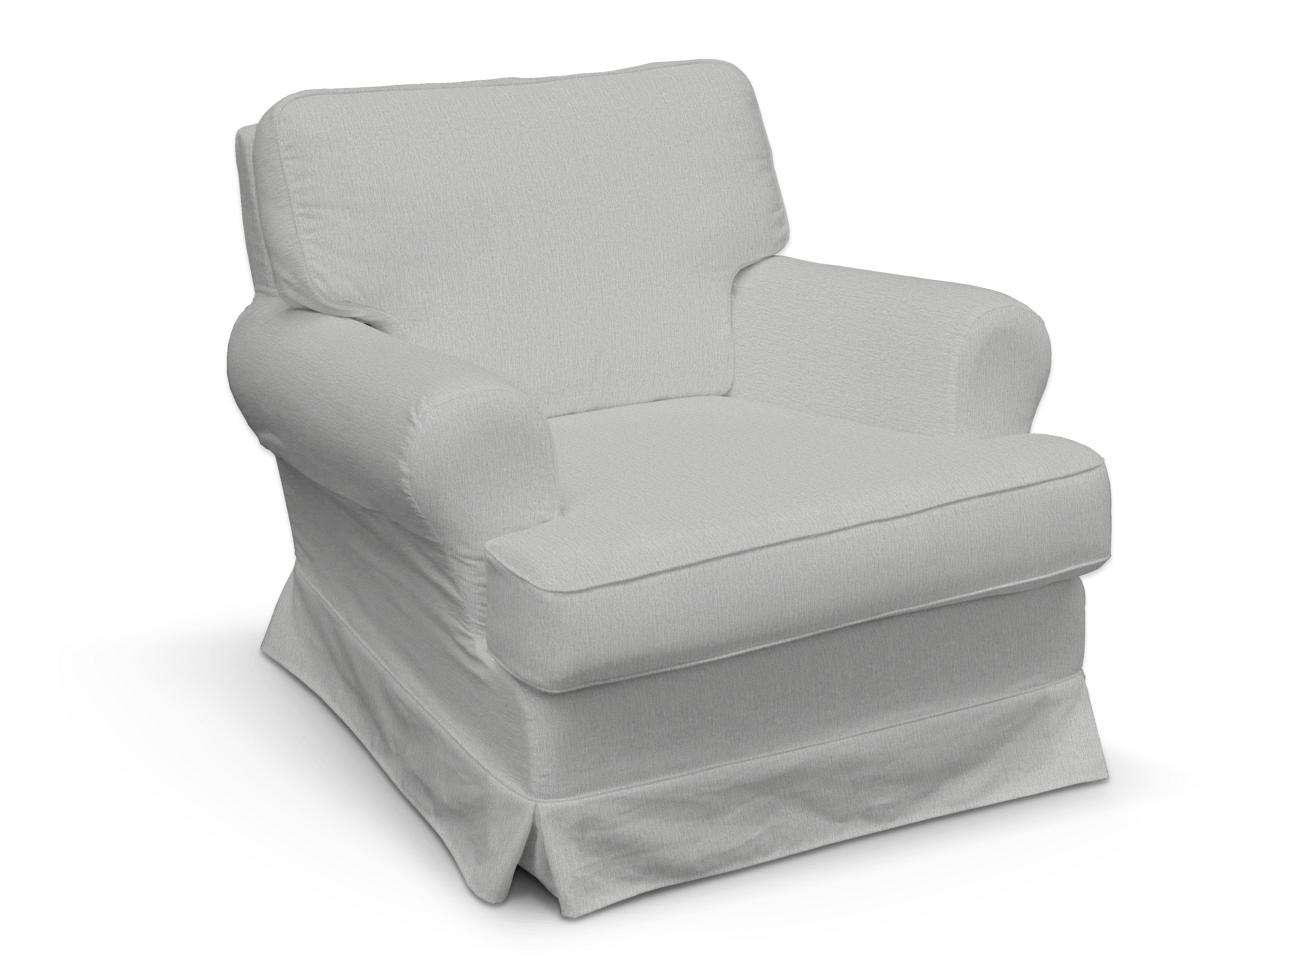 Barkaby Sesselbezug Sessel  Barkaby von der Kollektion Chenille , Stoff: 702-23